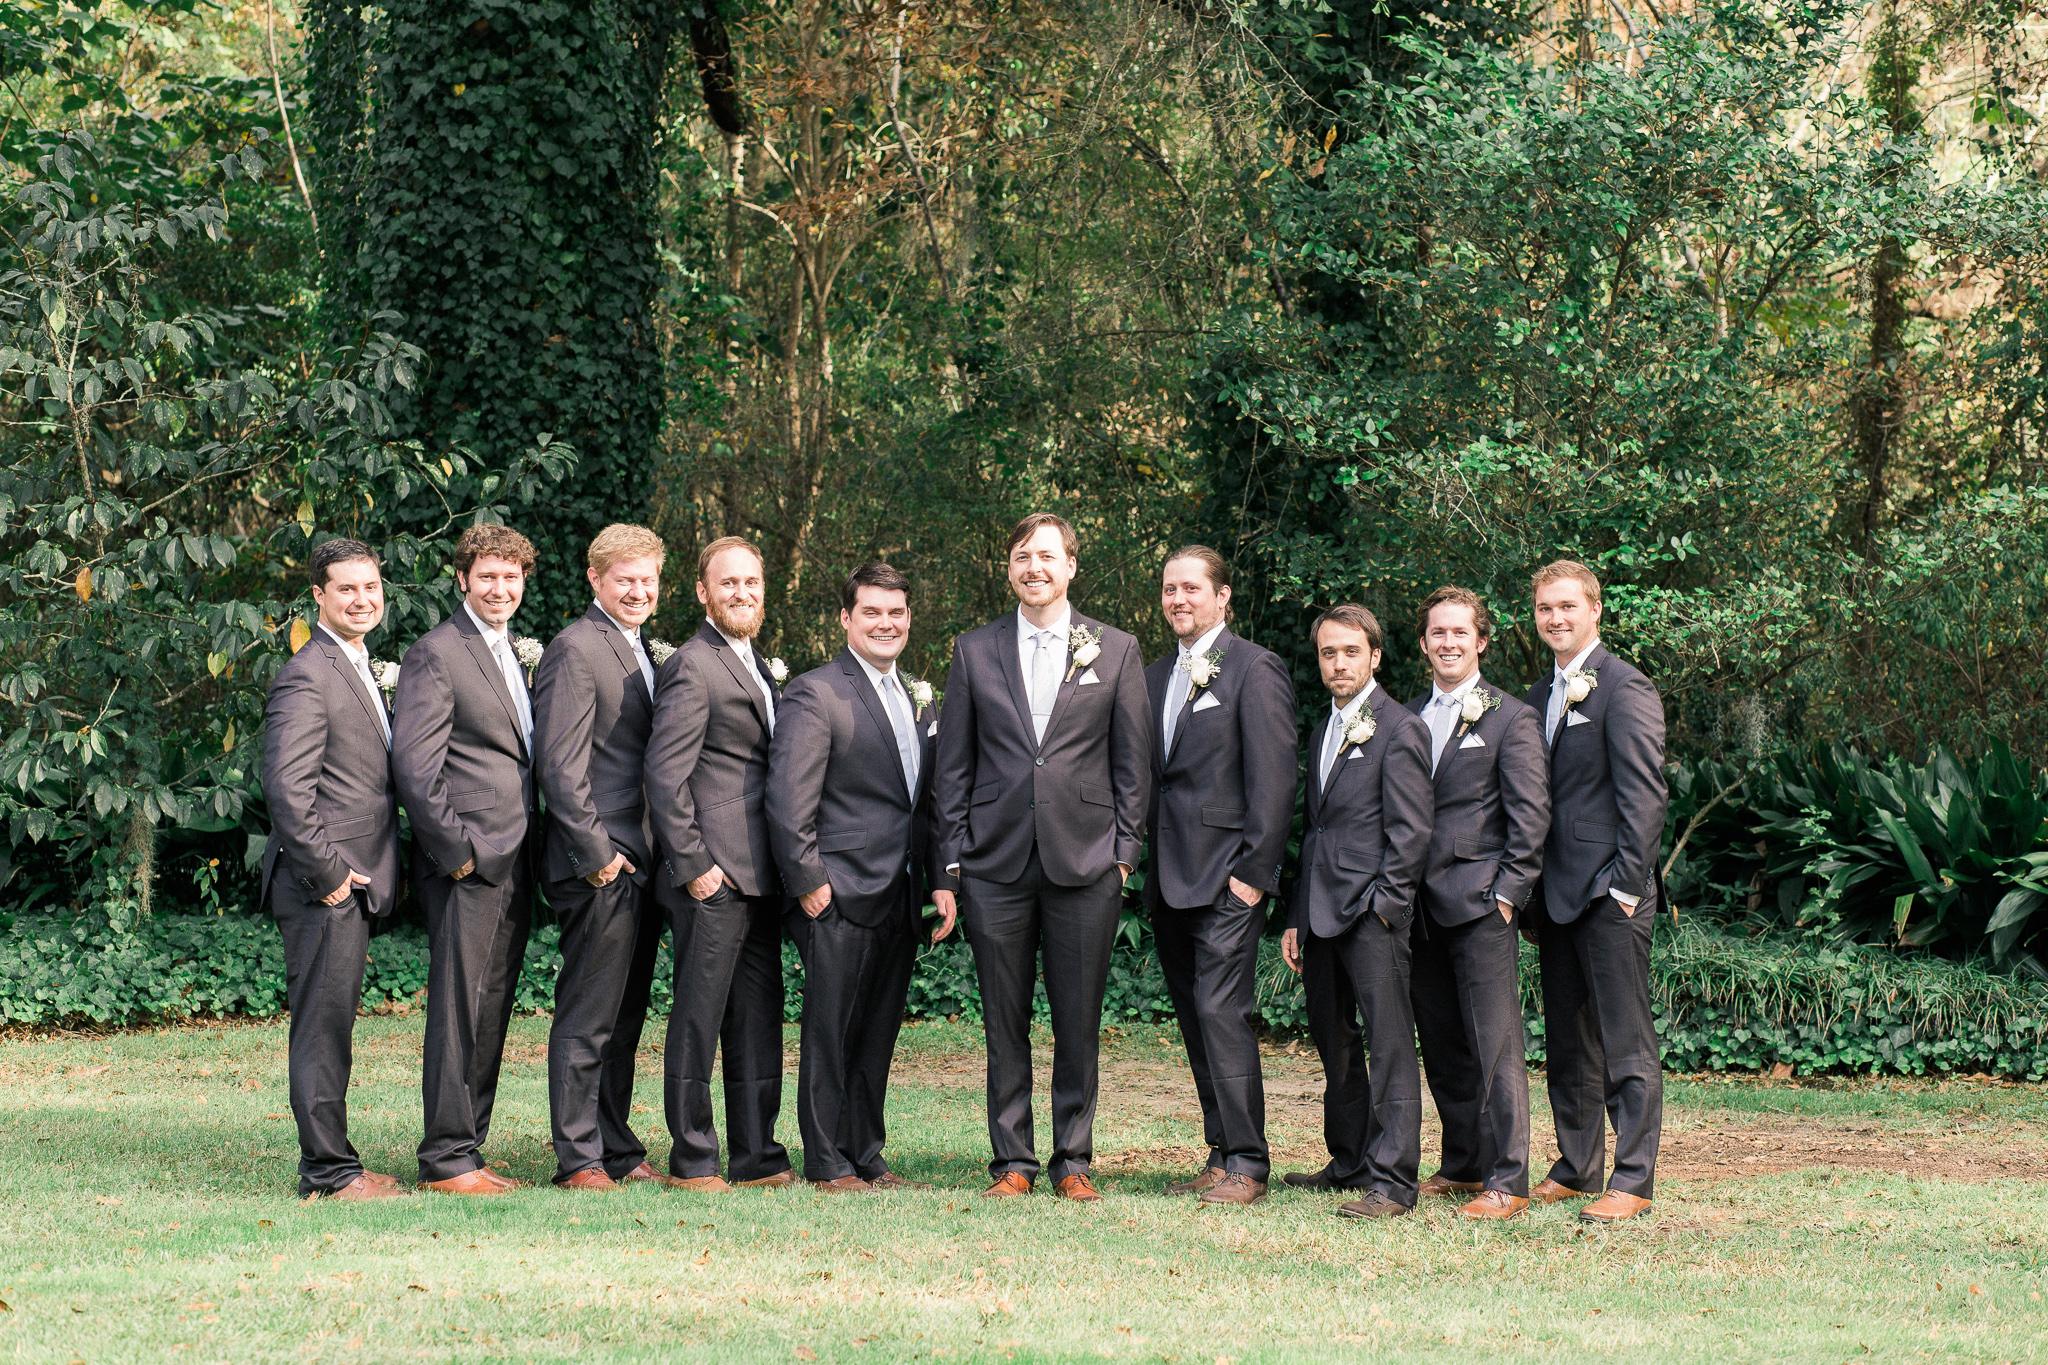 groomsmen-group-photo-black-suits